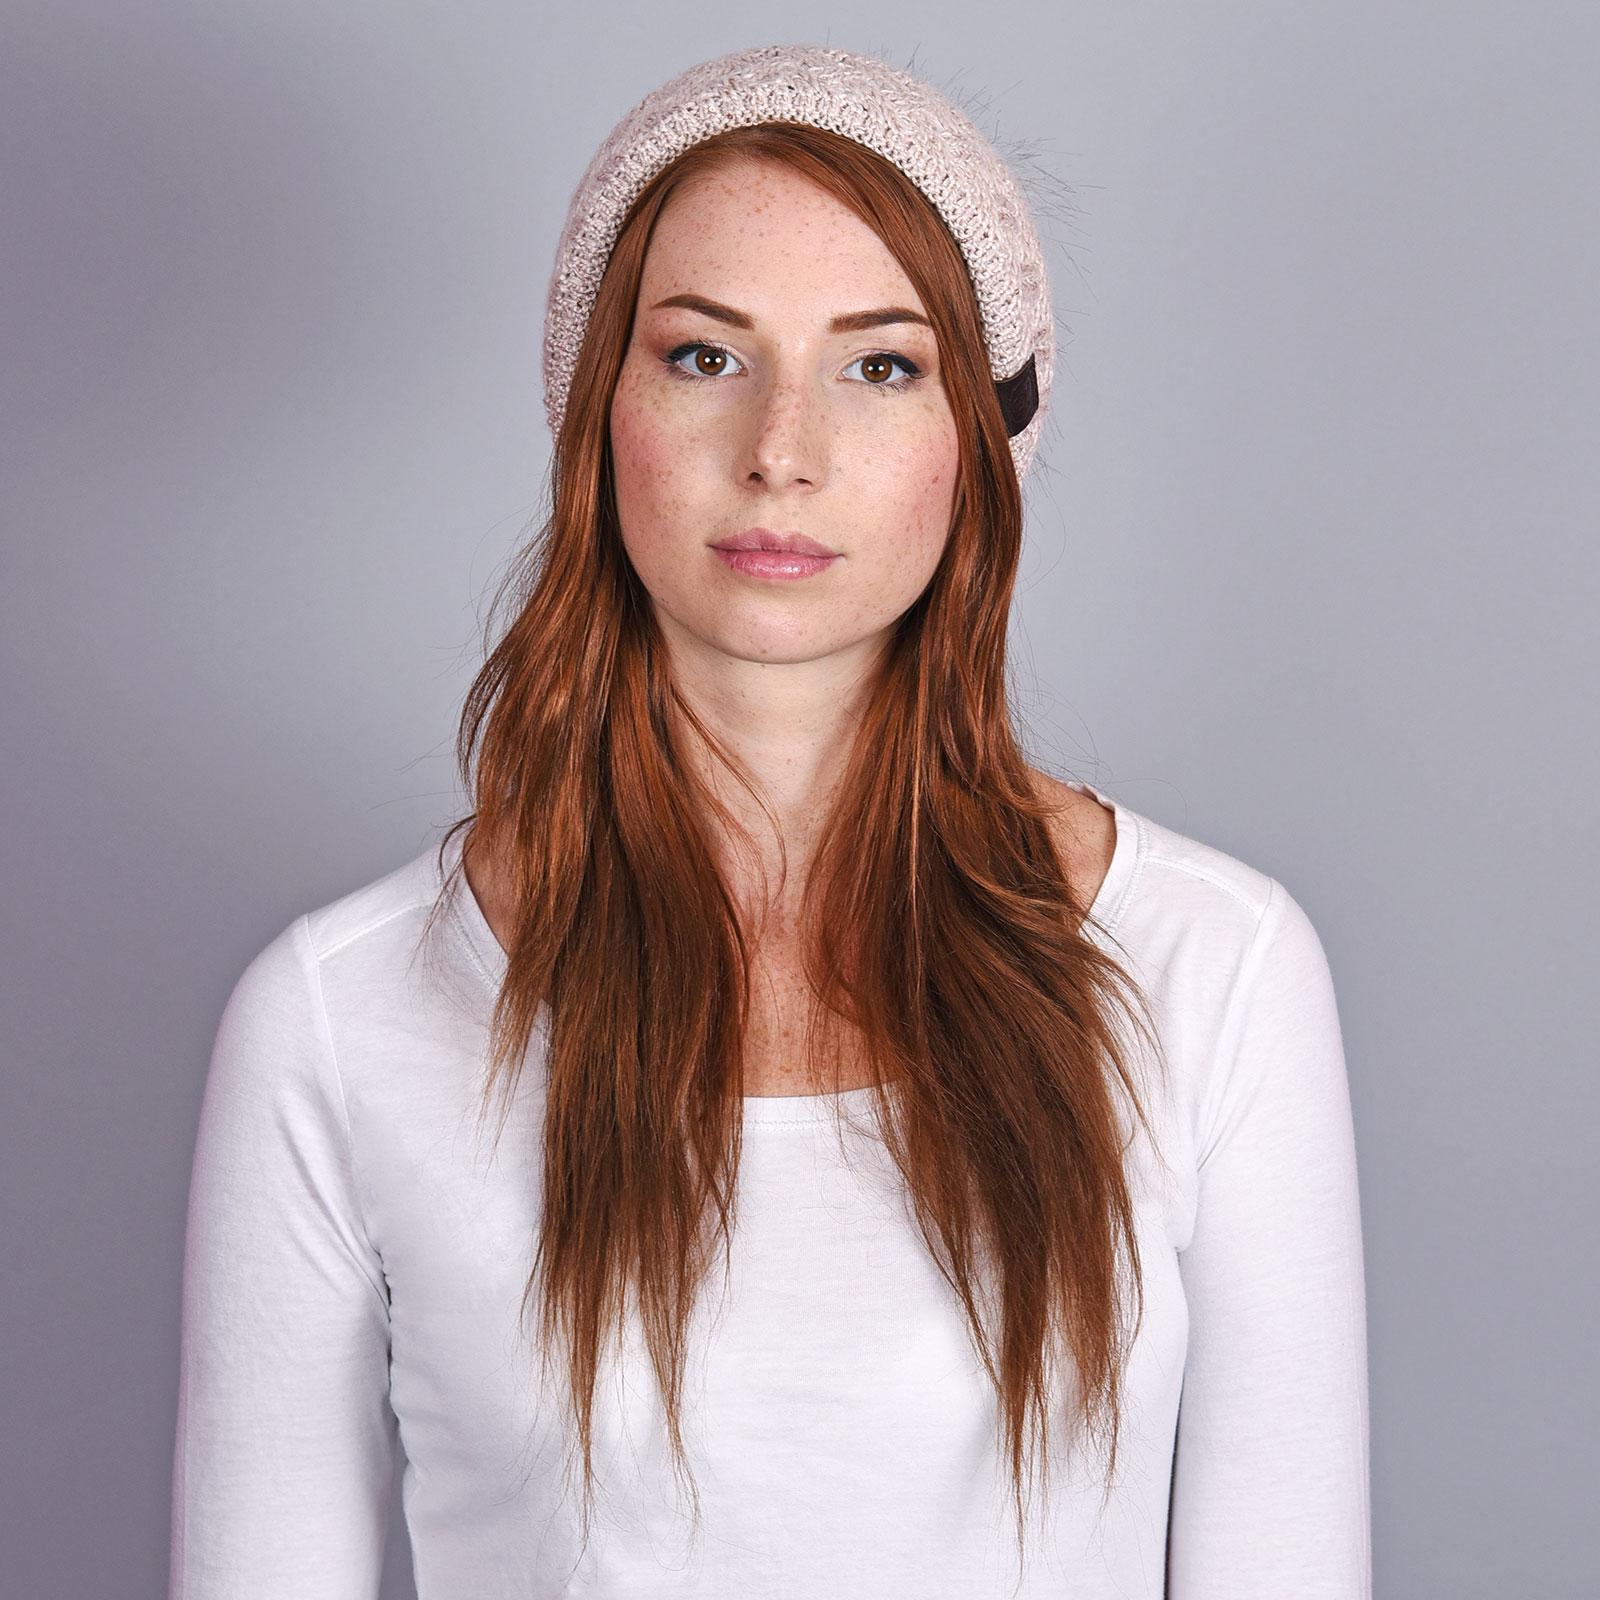 CP-01030-VF16-2-bonnet-tendance-rose-coquille